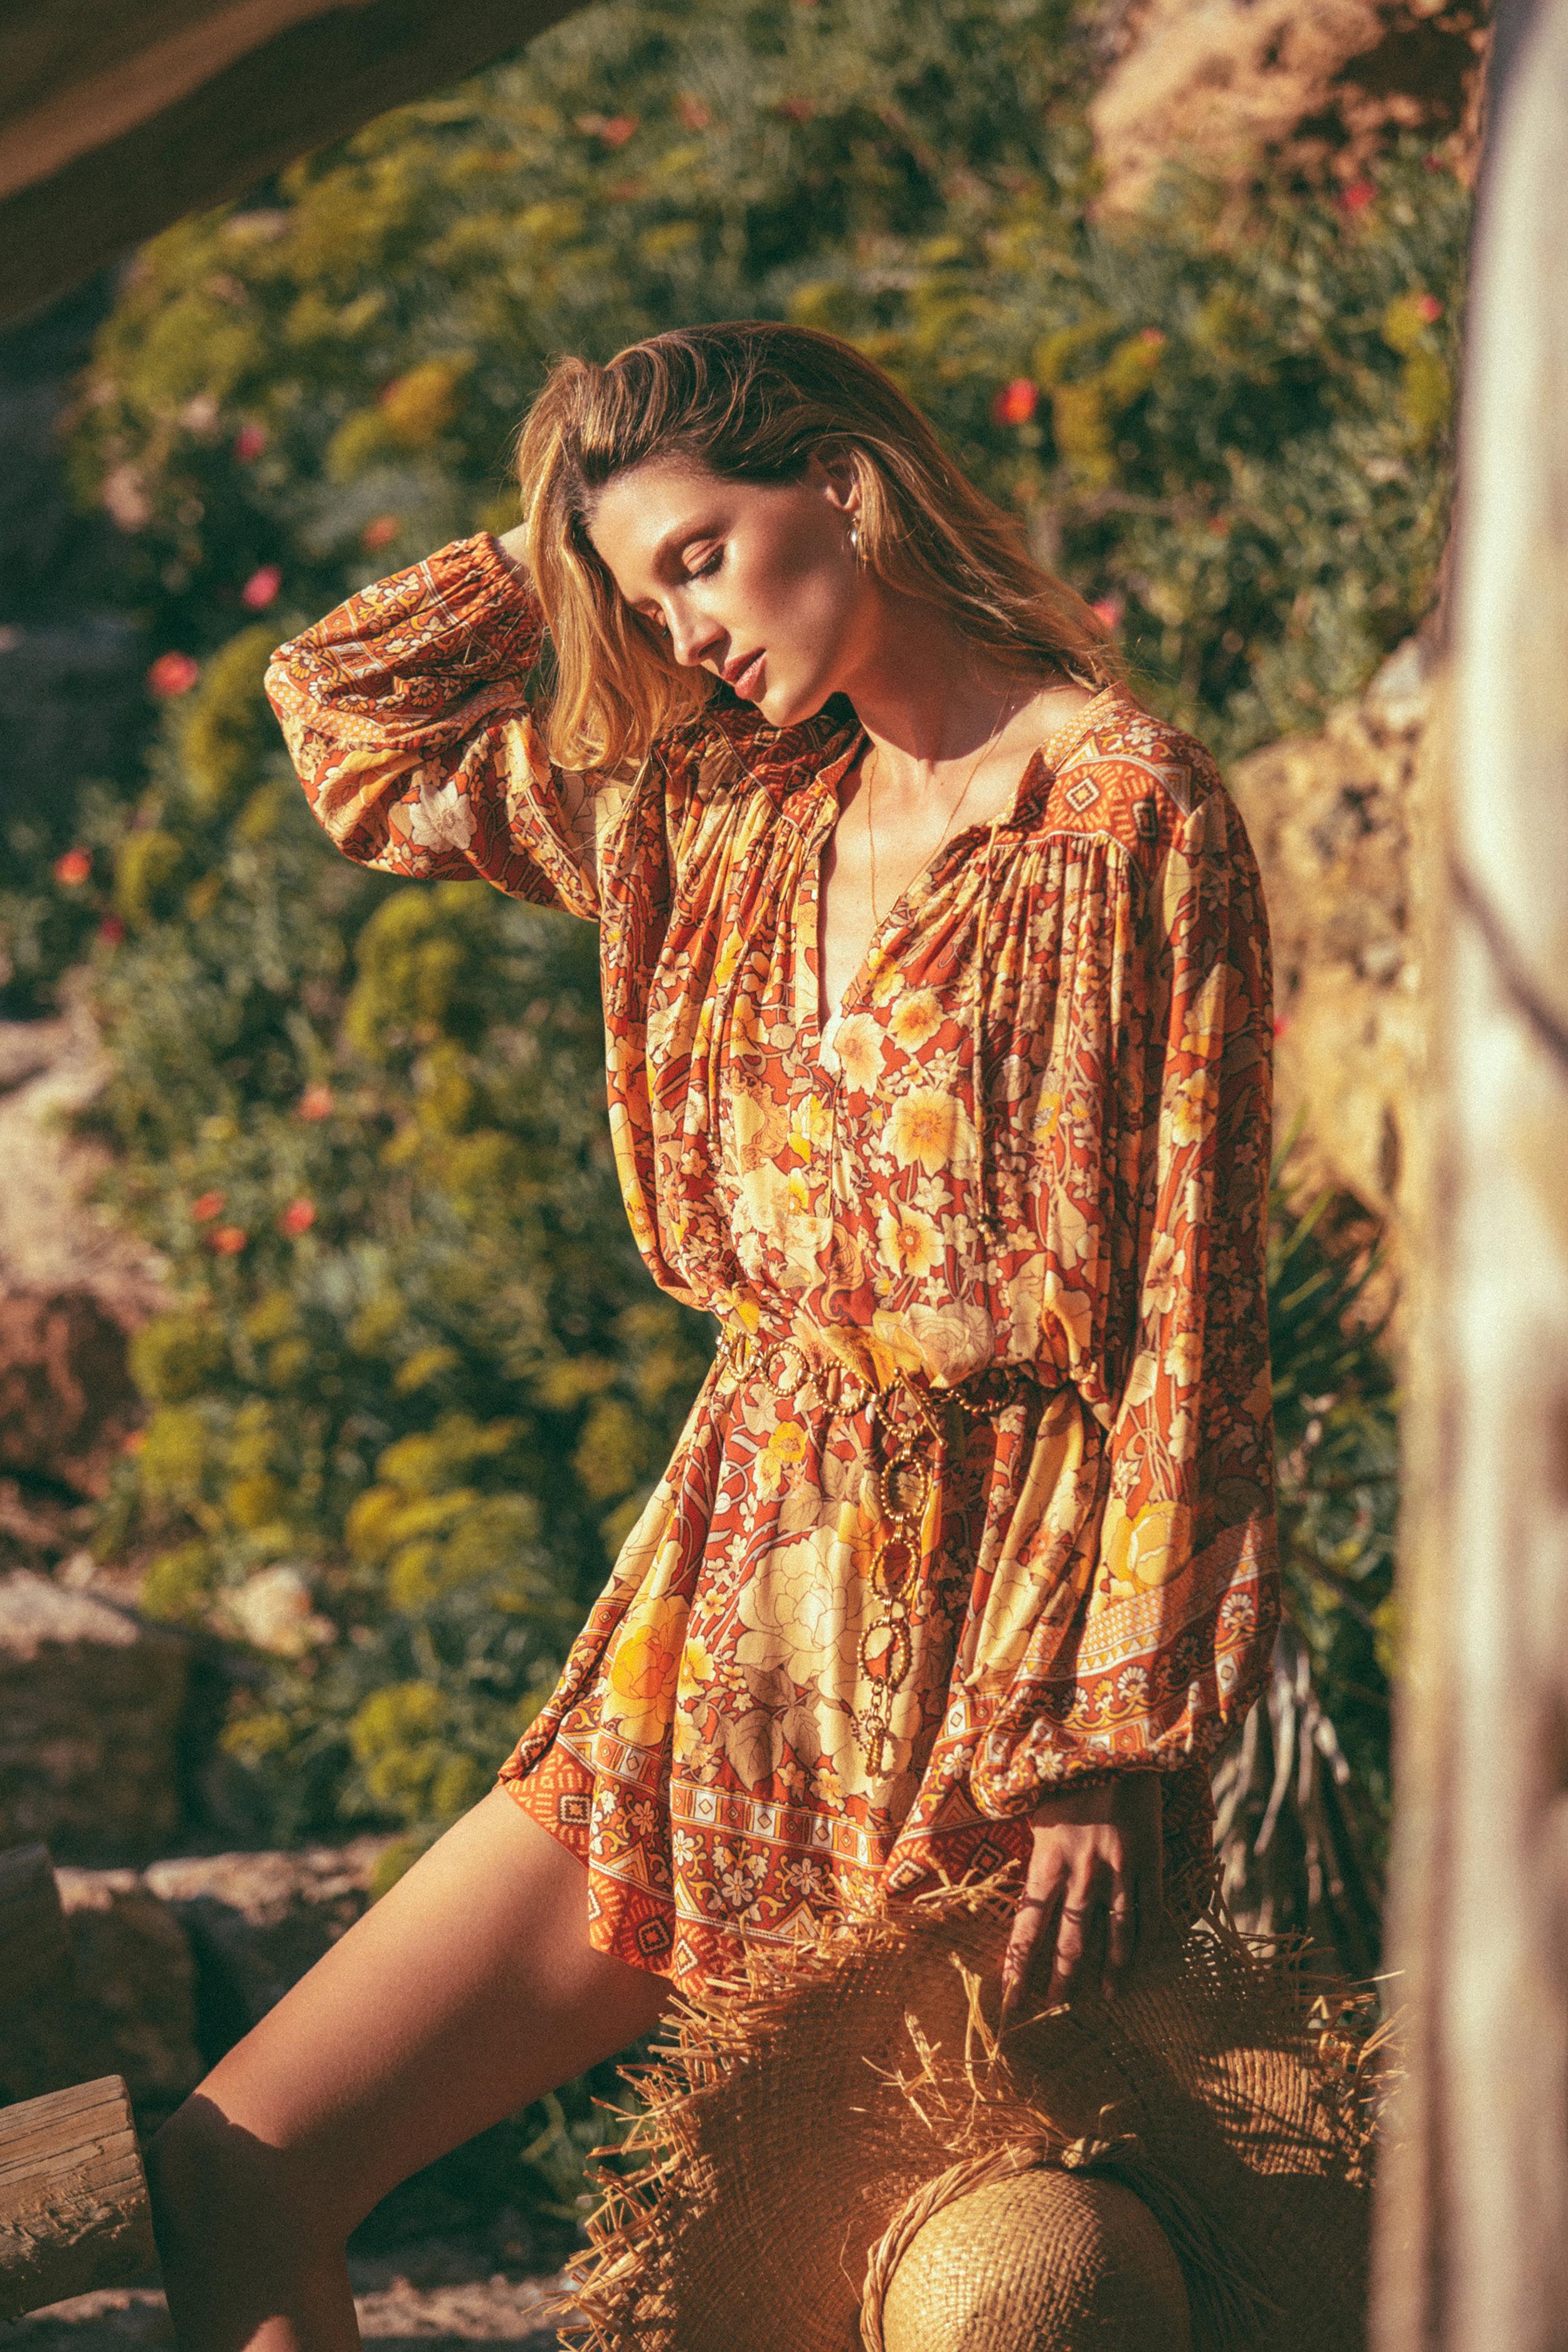 Spell-Amethyst-Keyhole-Smock-Dress-Amber-LadyAmethyst-5187.jpg